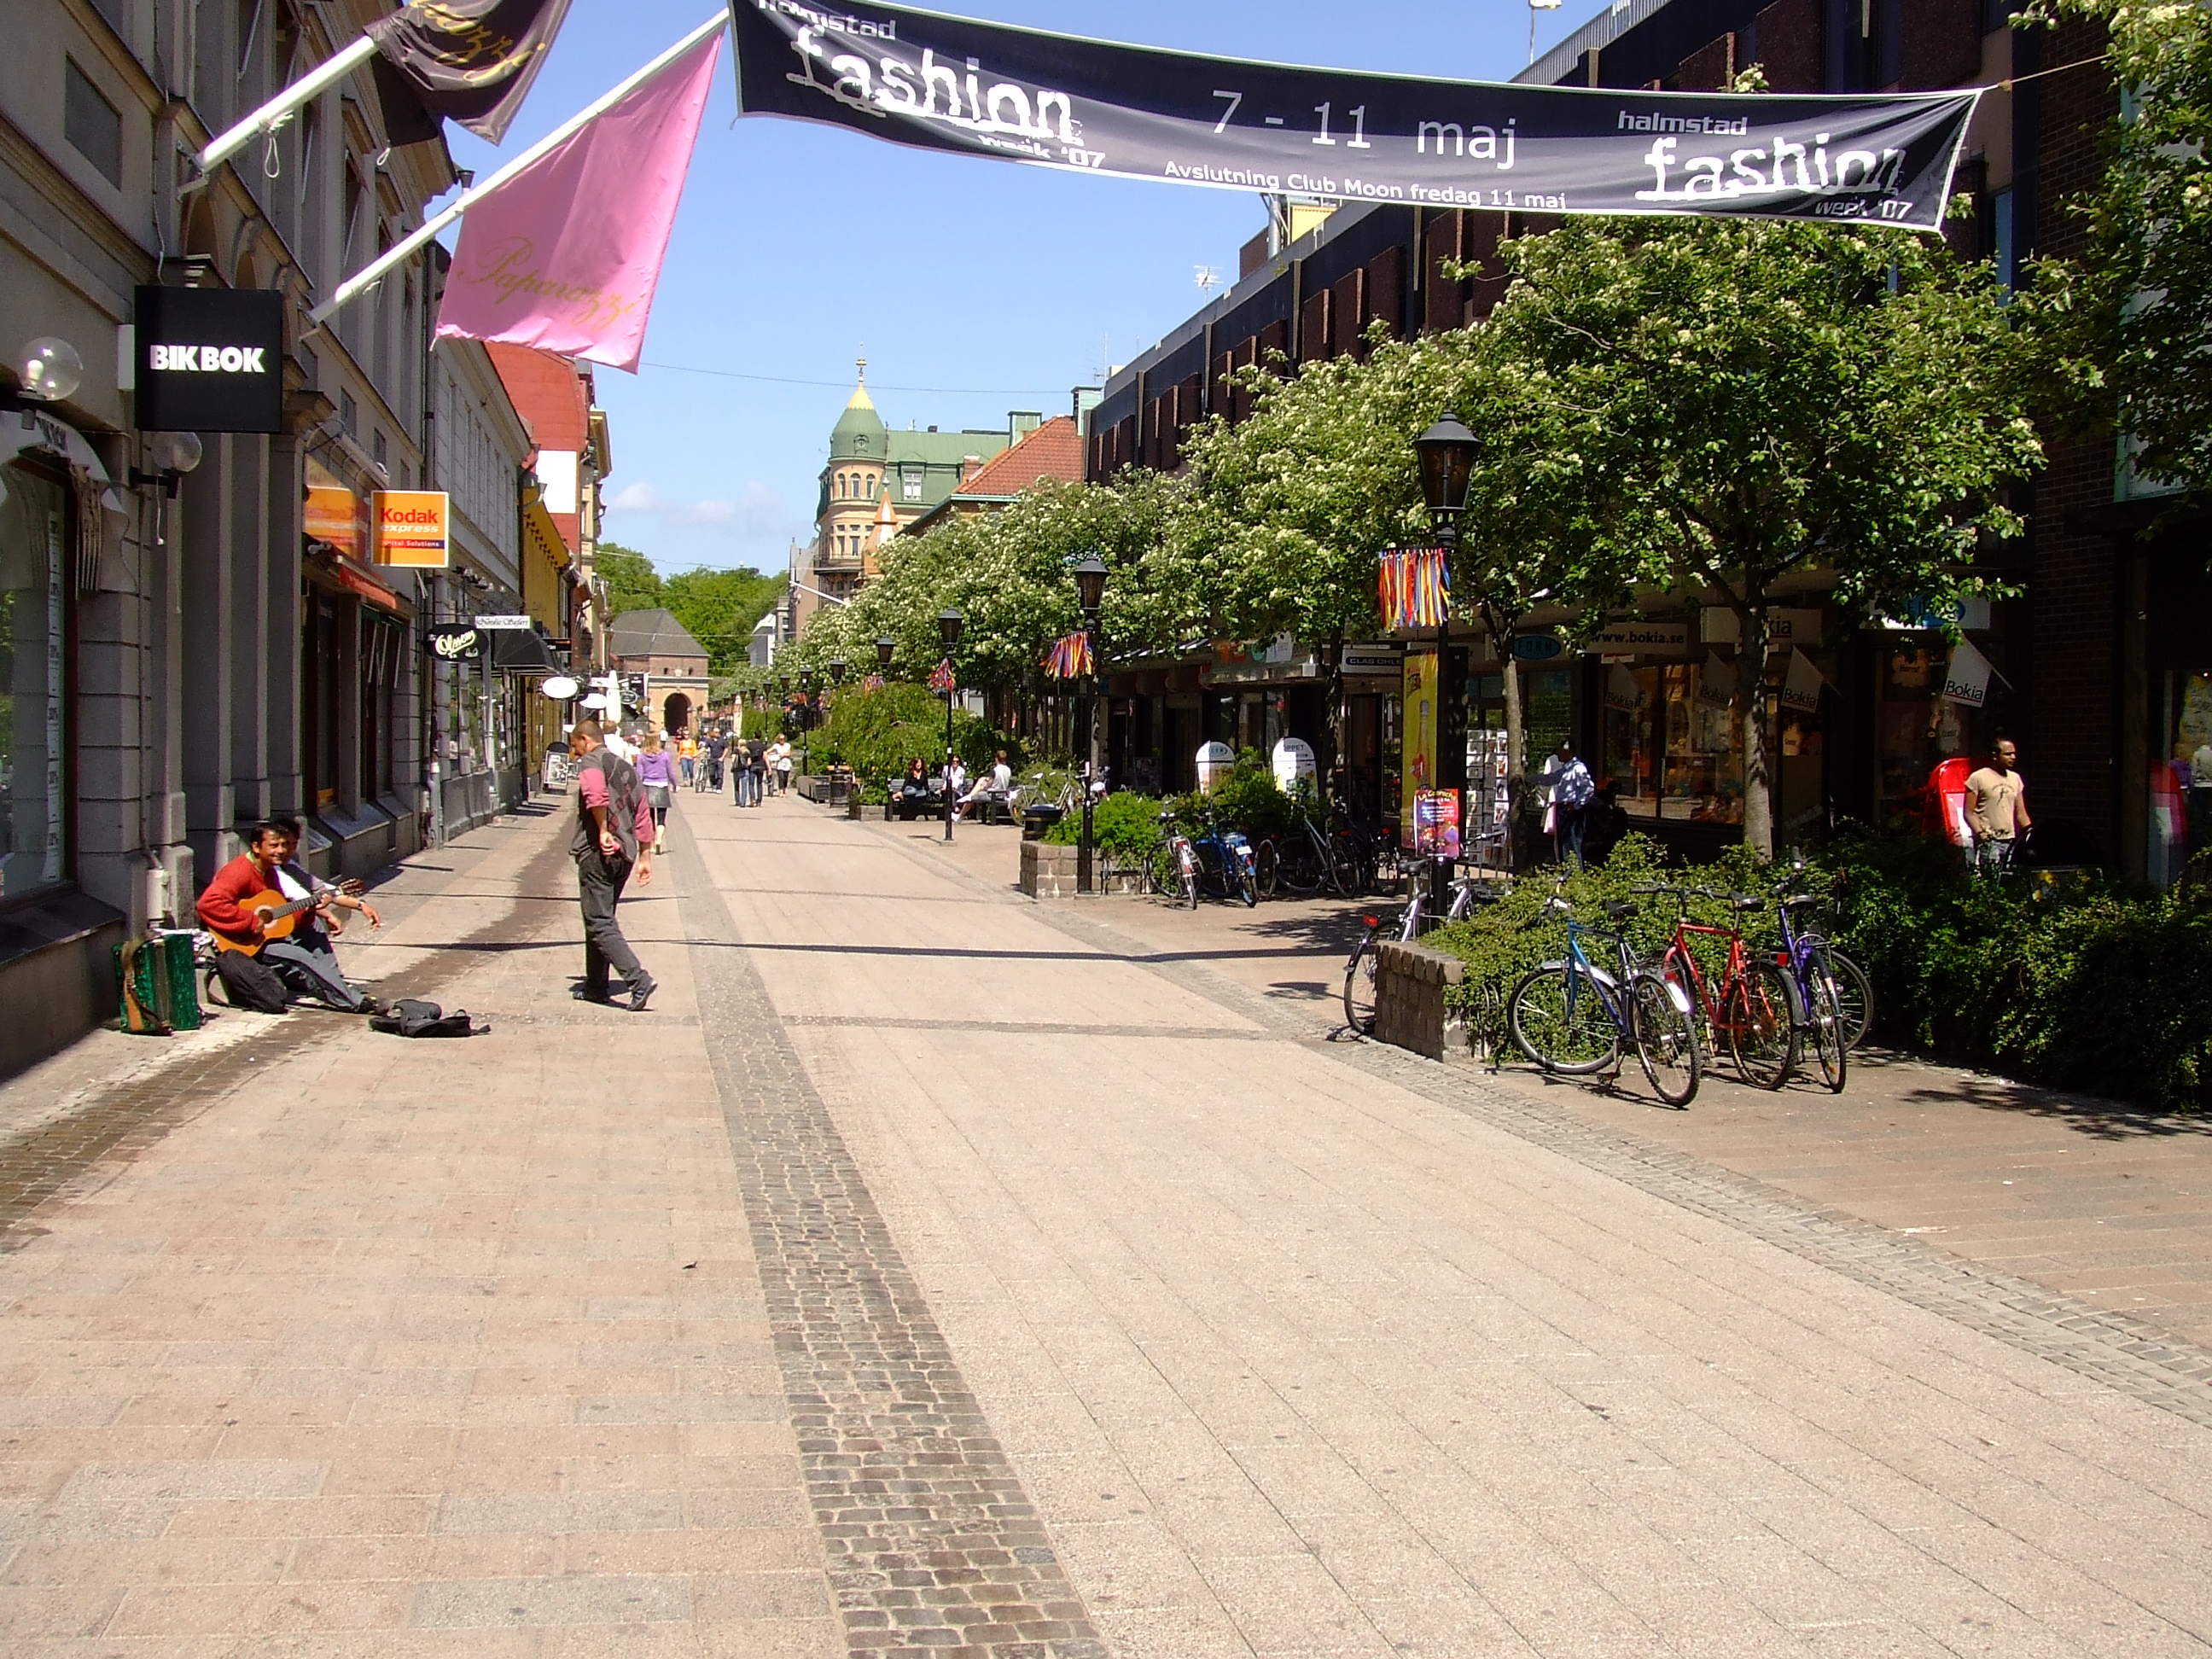 File:Storgatan, Halmstad.JPG - Wikitravel